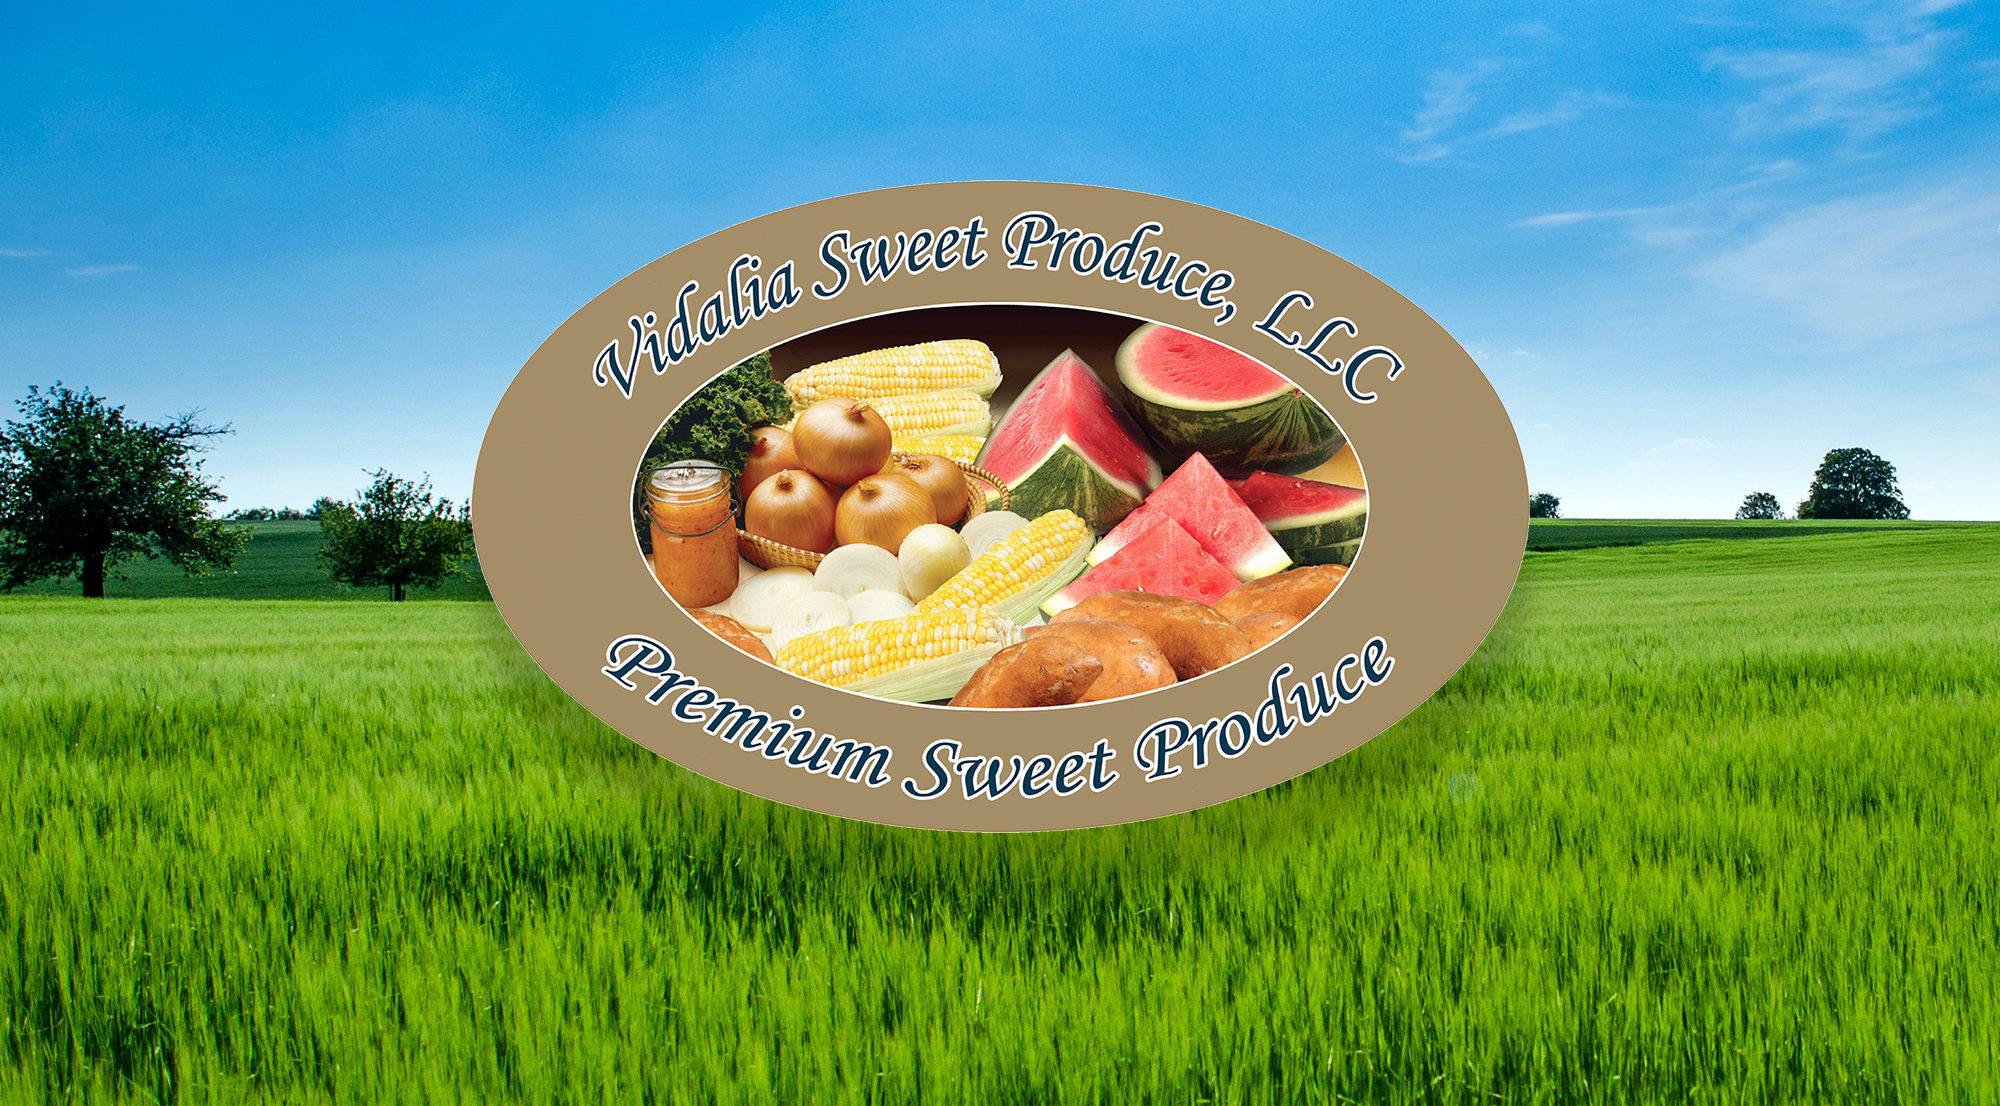 Vidalia Sweet Produce